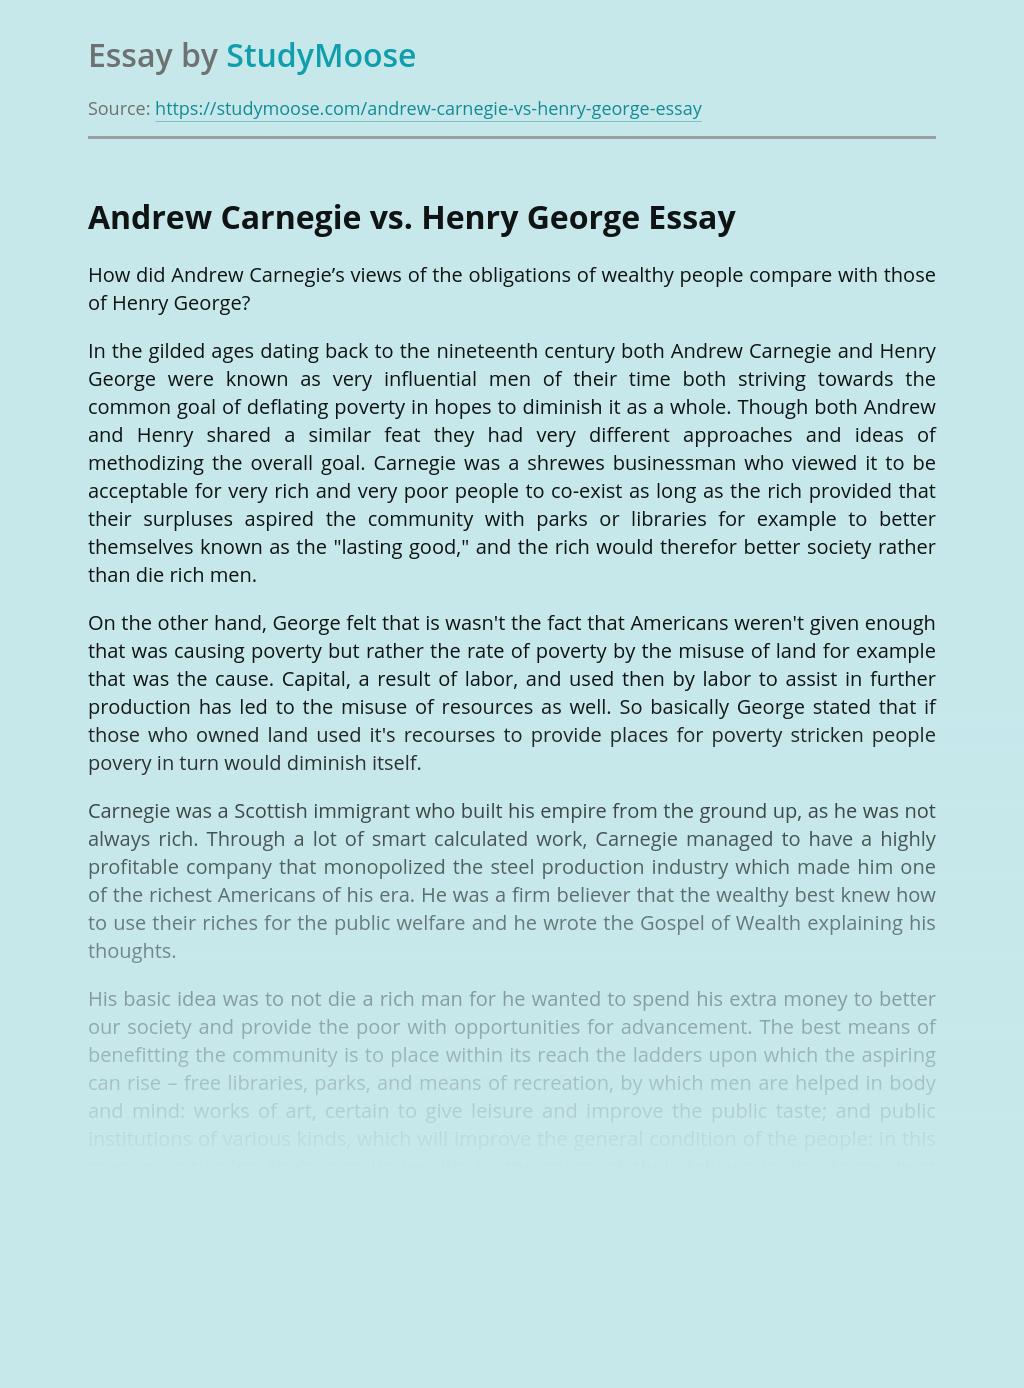 Andrew Carnegie vs. Henry George